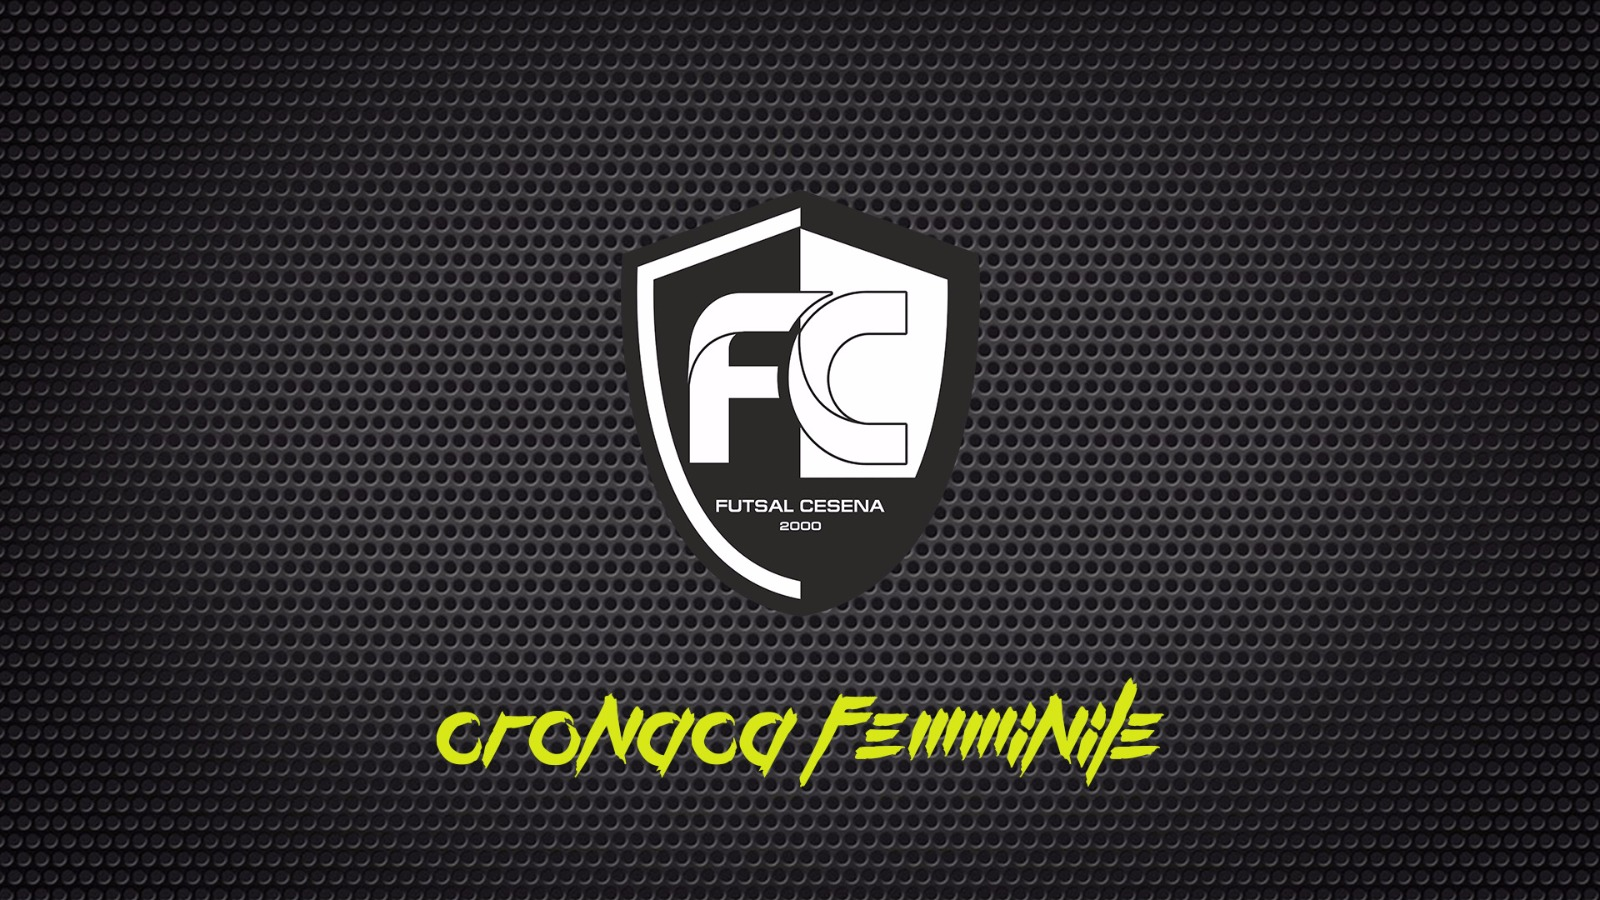 4° Coppa – Virtus Romagna-Futsal Cesena femminile 3-2